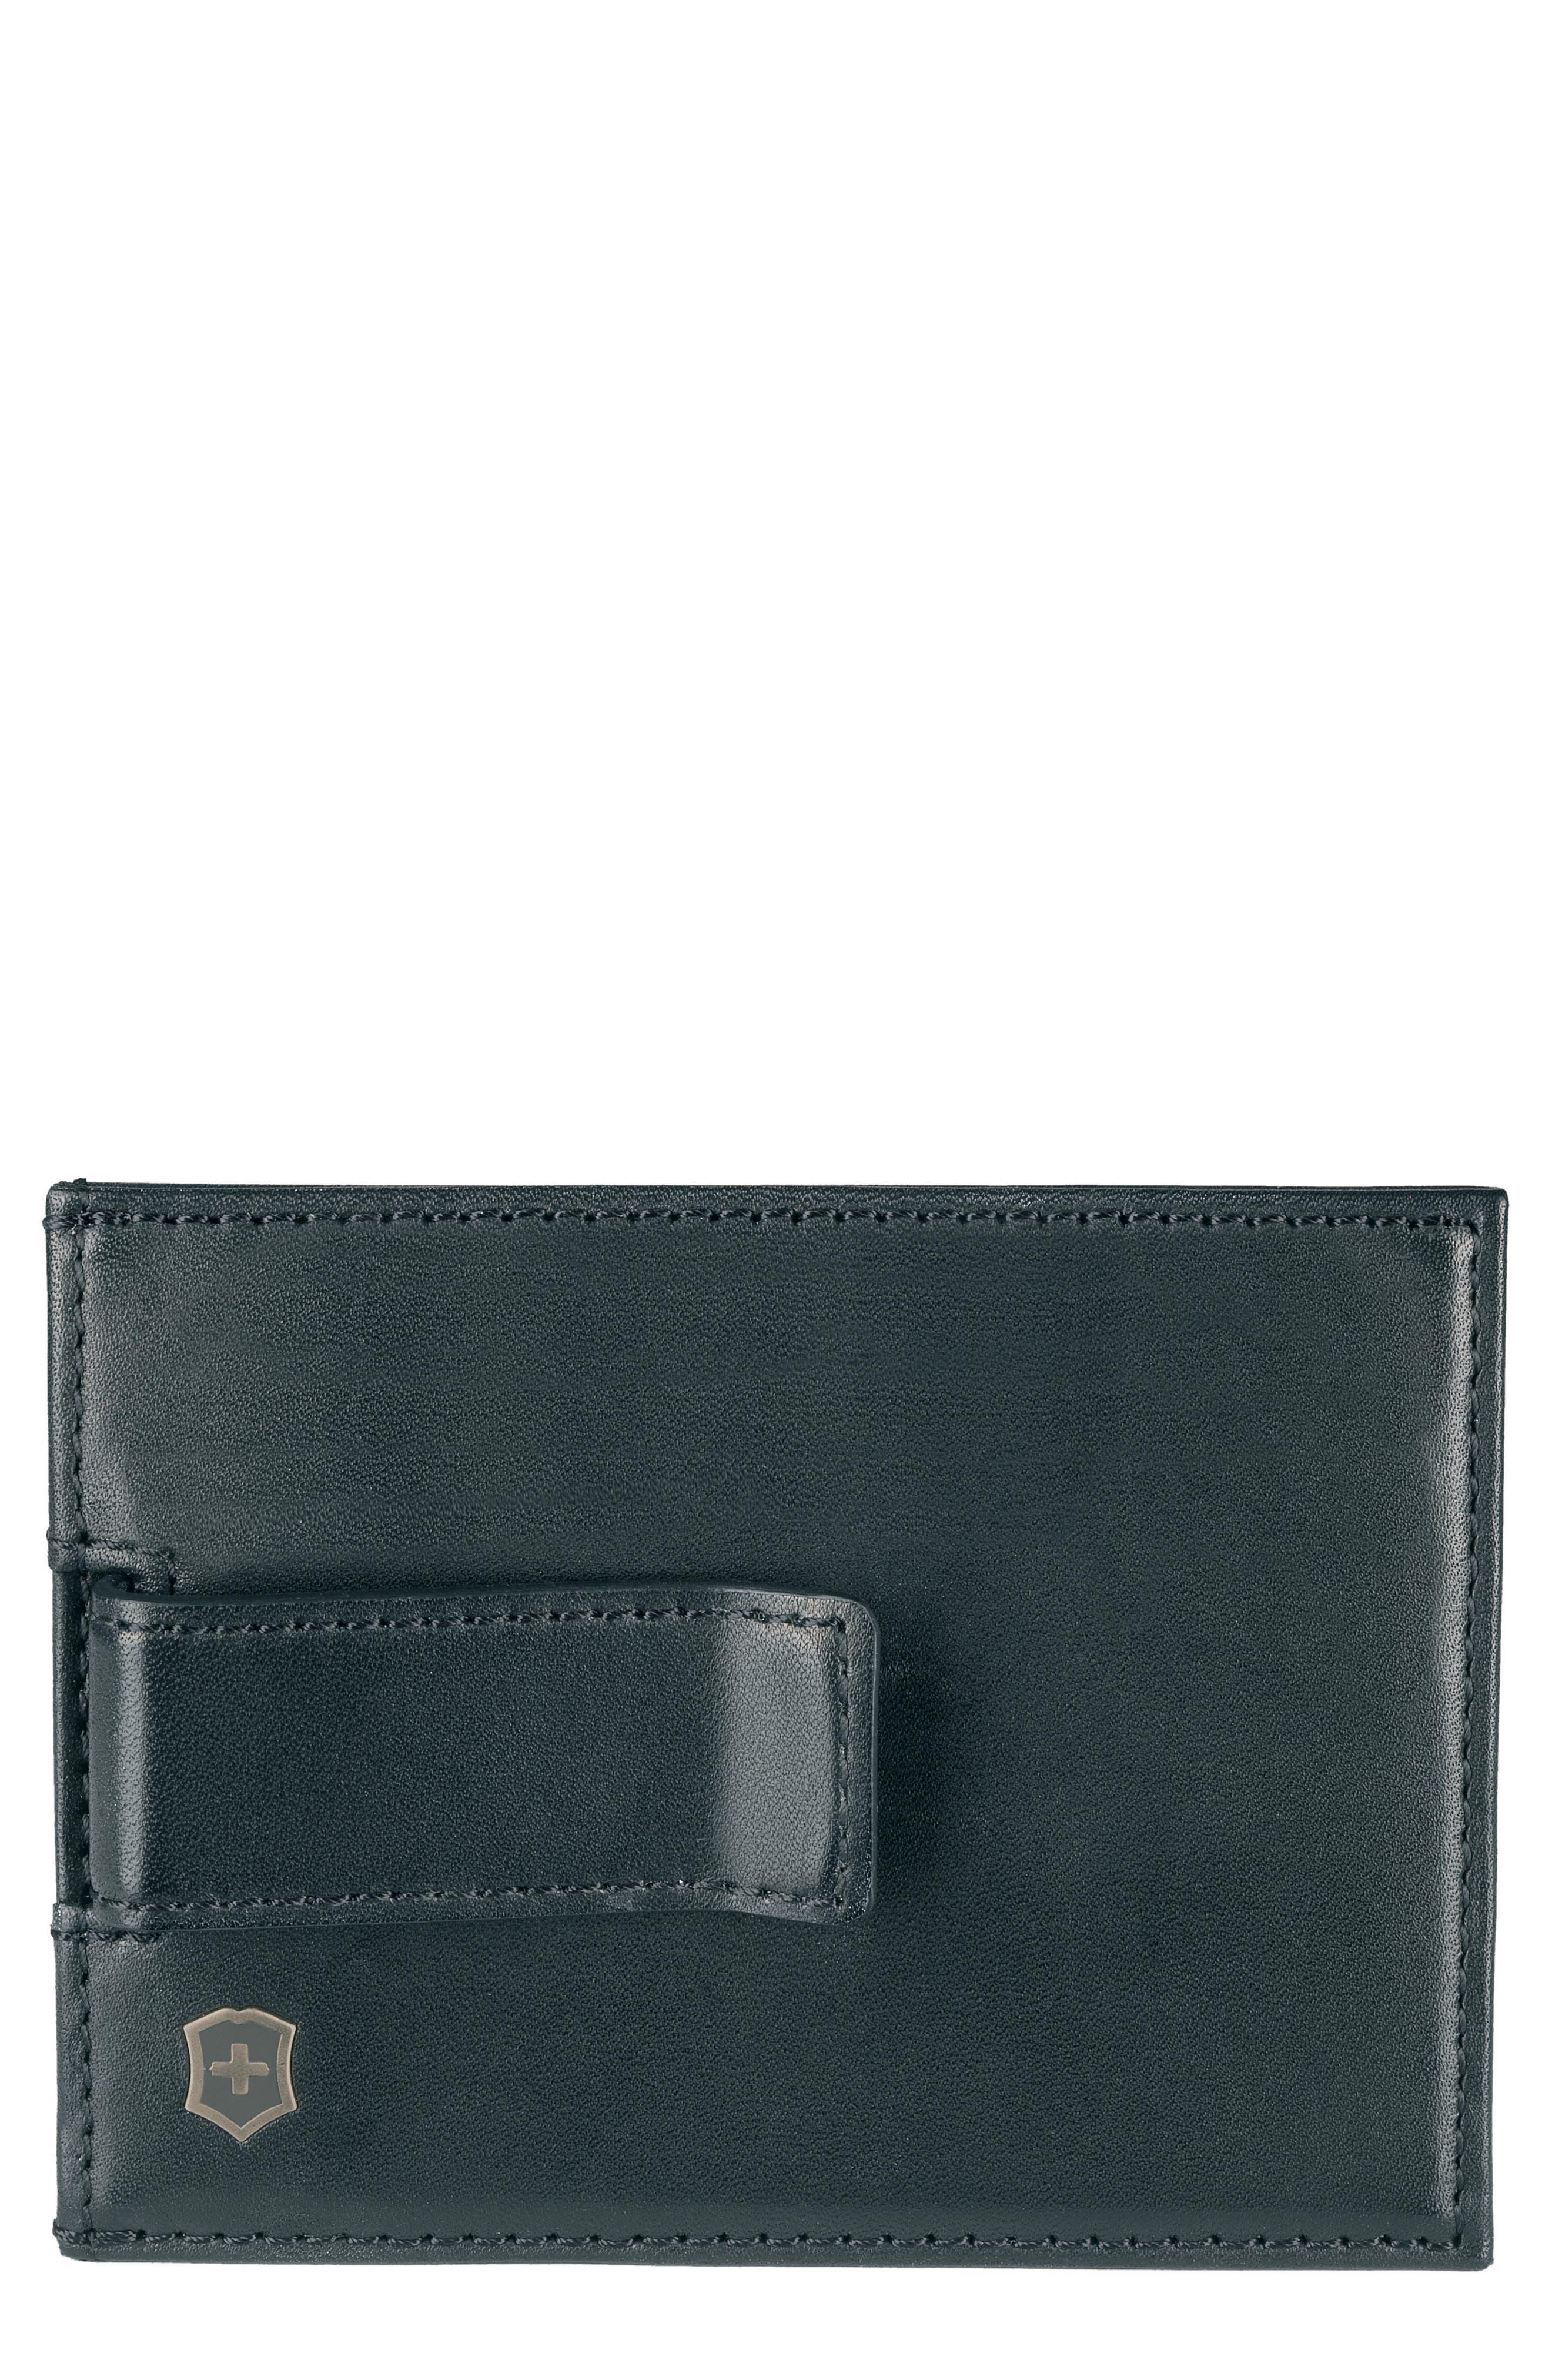 Victorinox Swiss Army® Altius Edge Napier Card Case